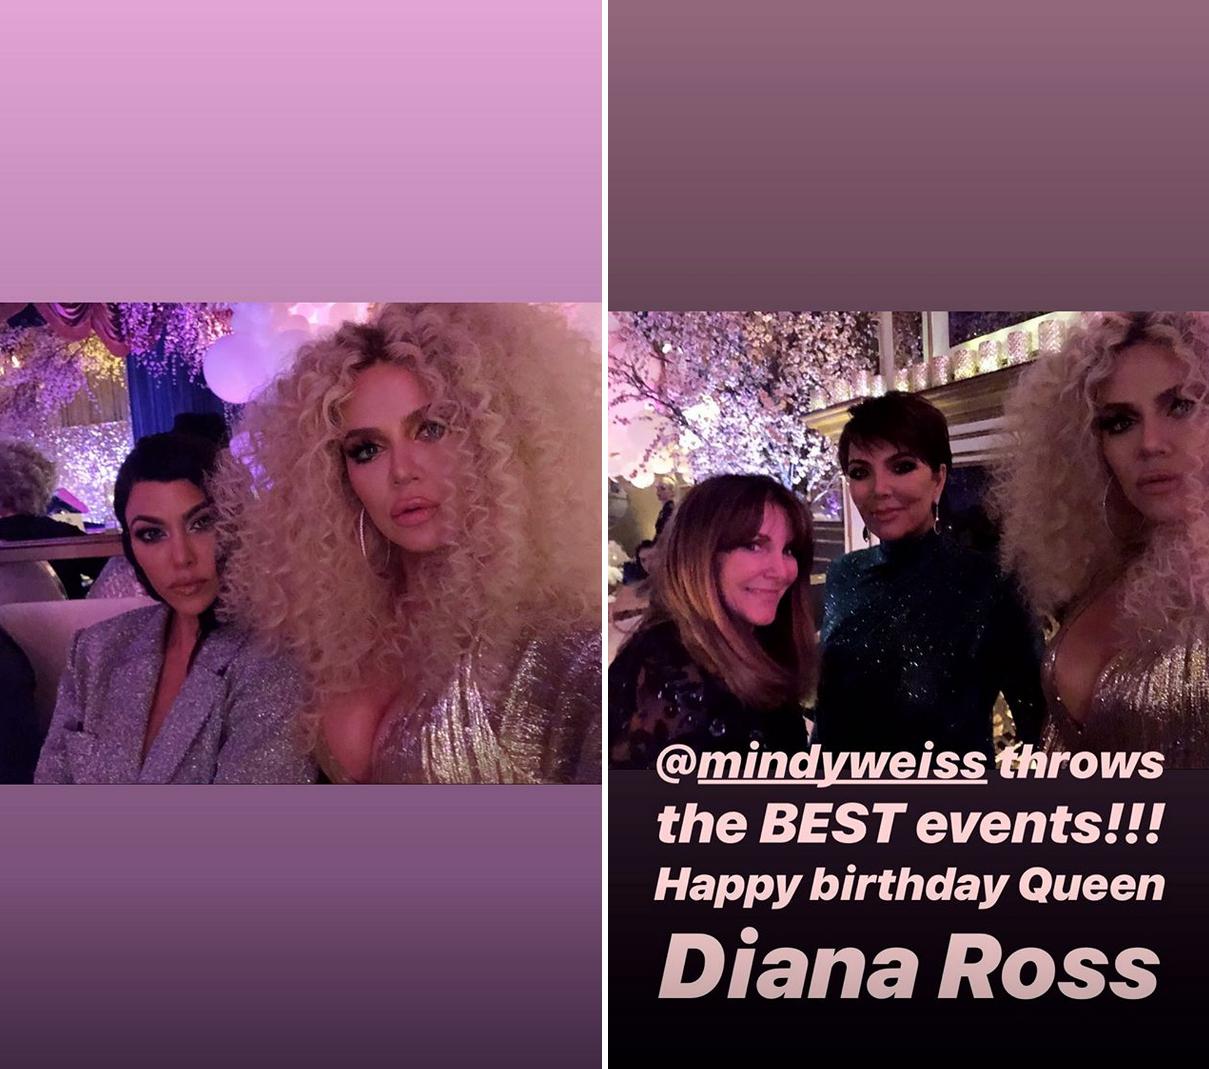 diana-ross-birthday-kardashians - Celebrity party planner Mindy Weiss organized the star-studded party.